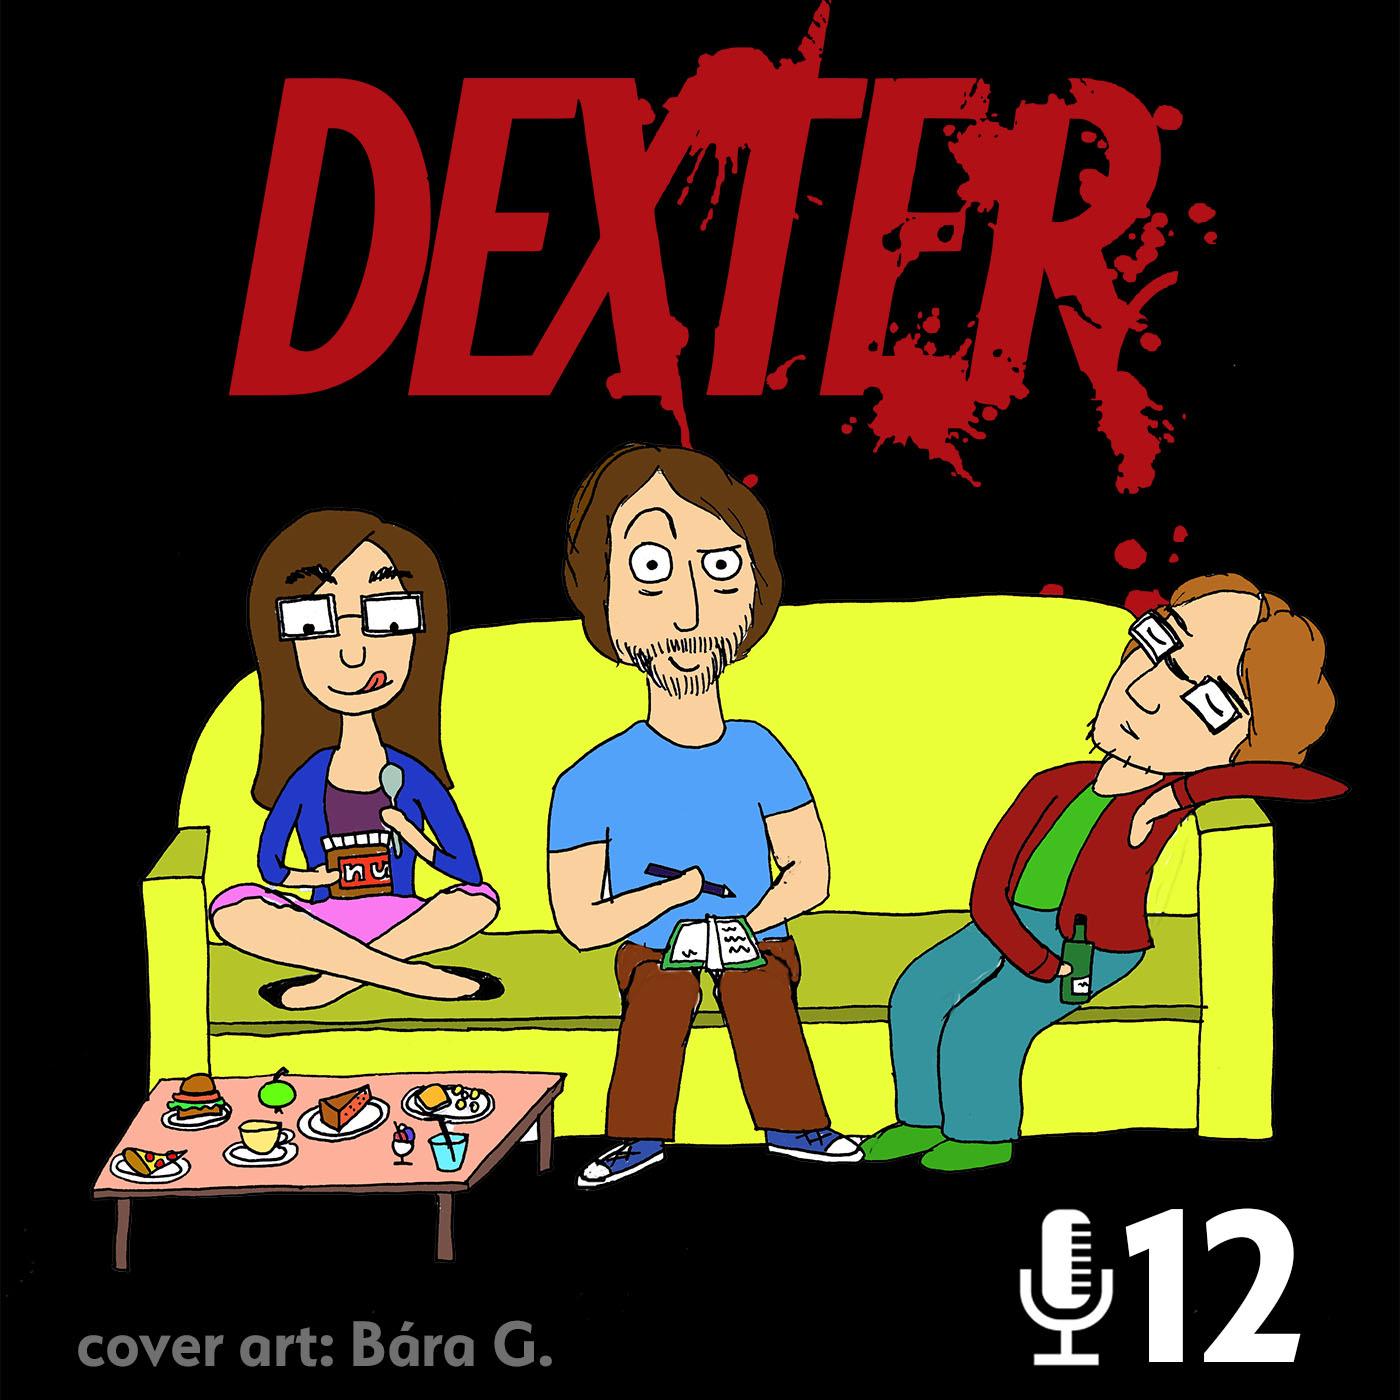 Epizoda 12 - Dexter